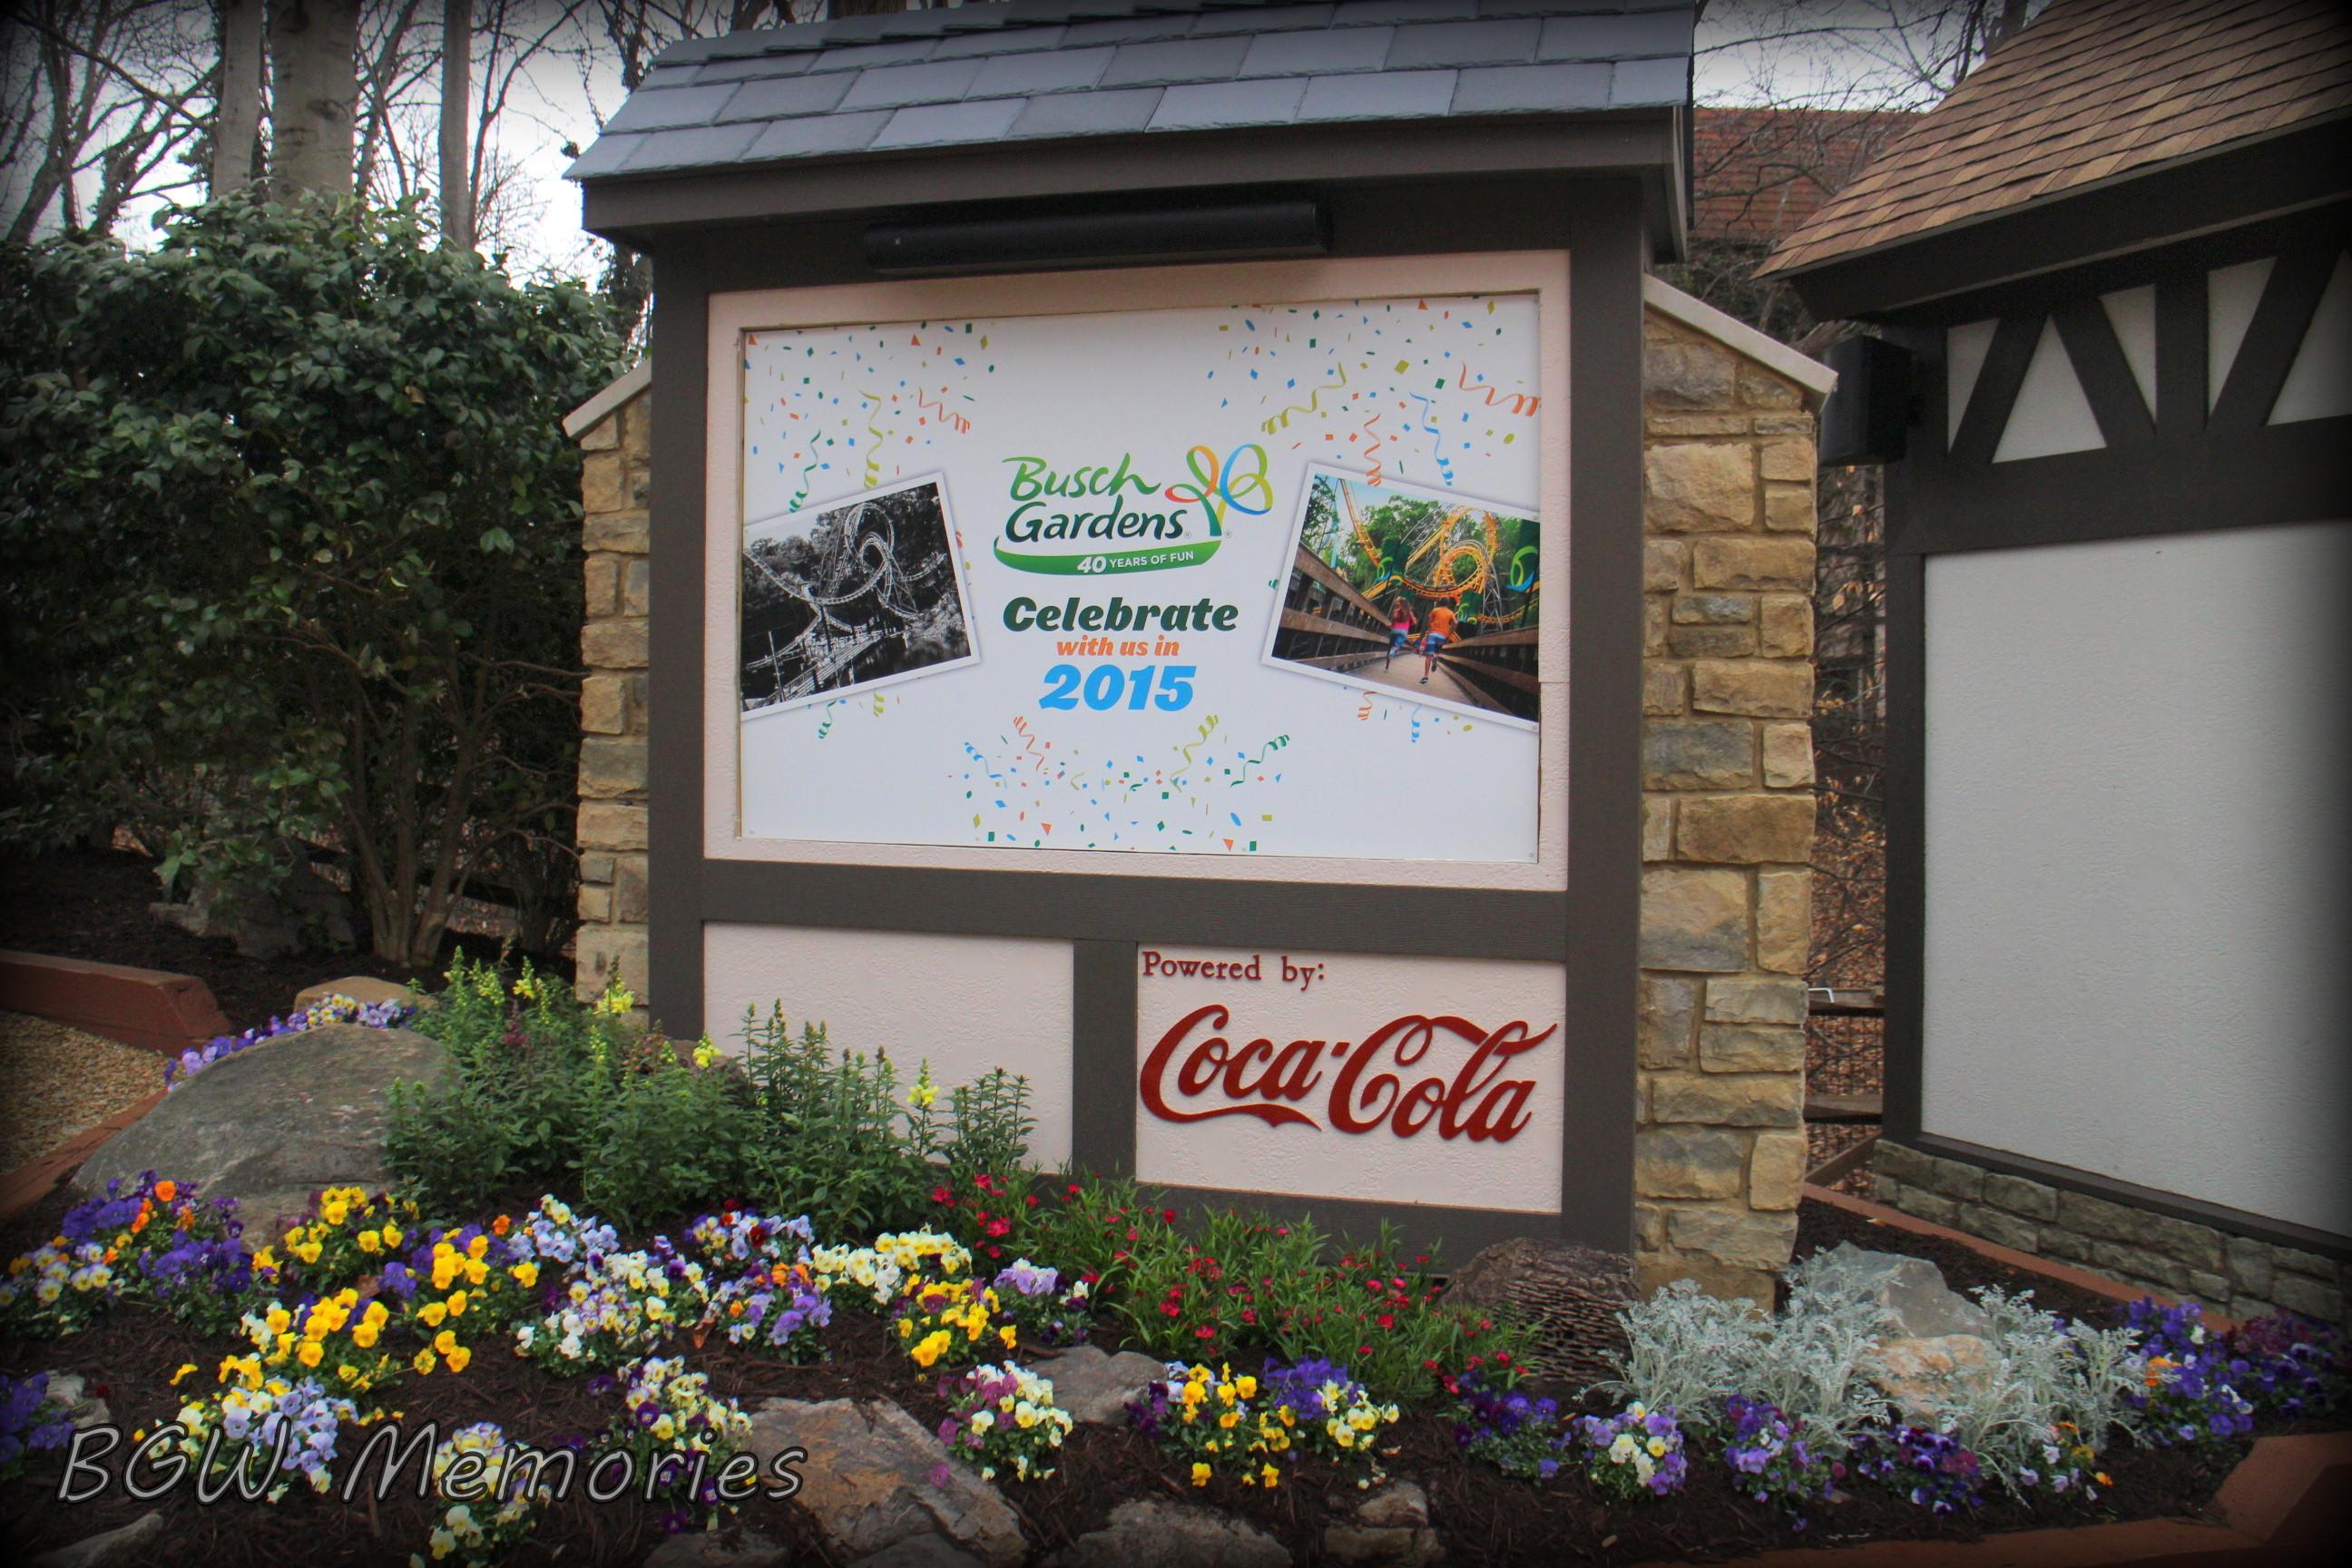 Busch Gardens 40th Anniversary Bgw Memories